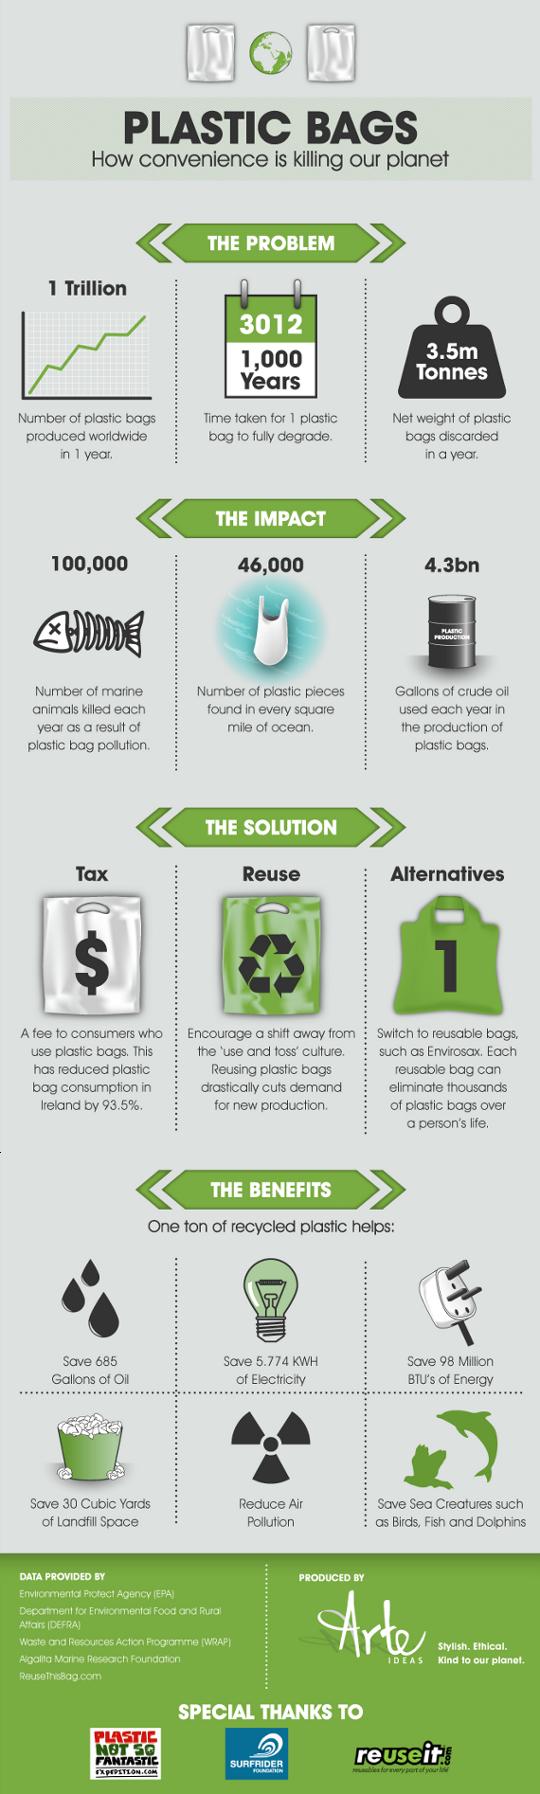 plastic-bags-infographic